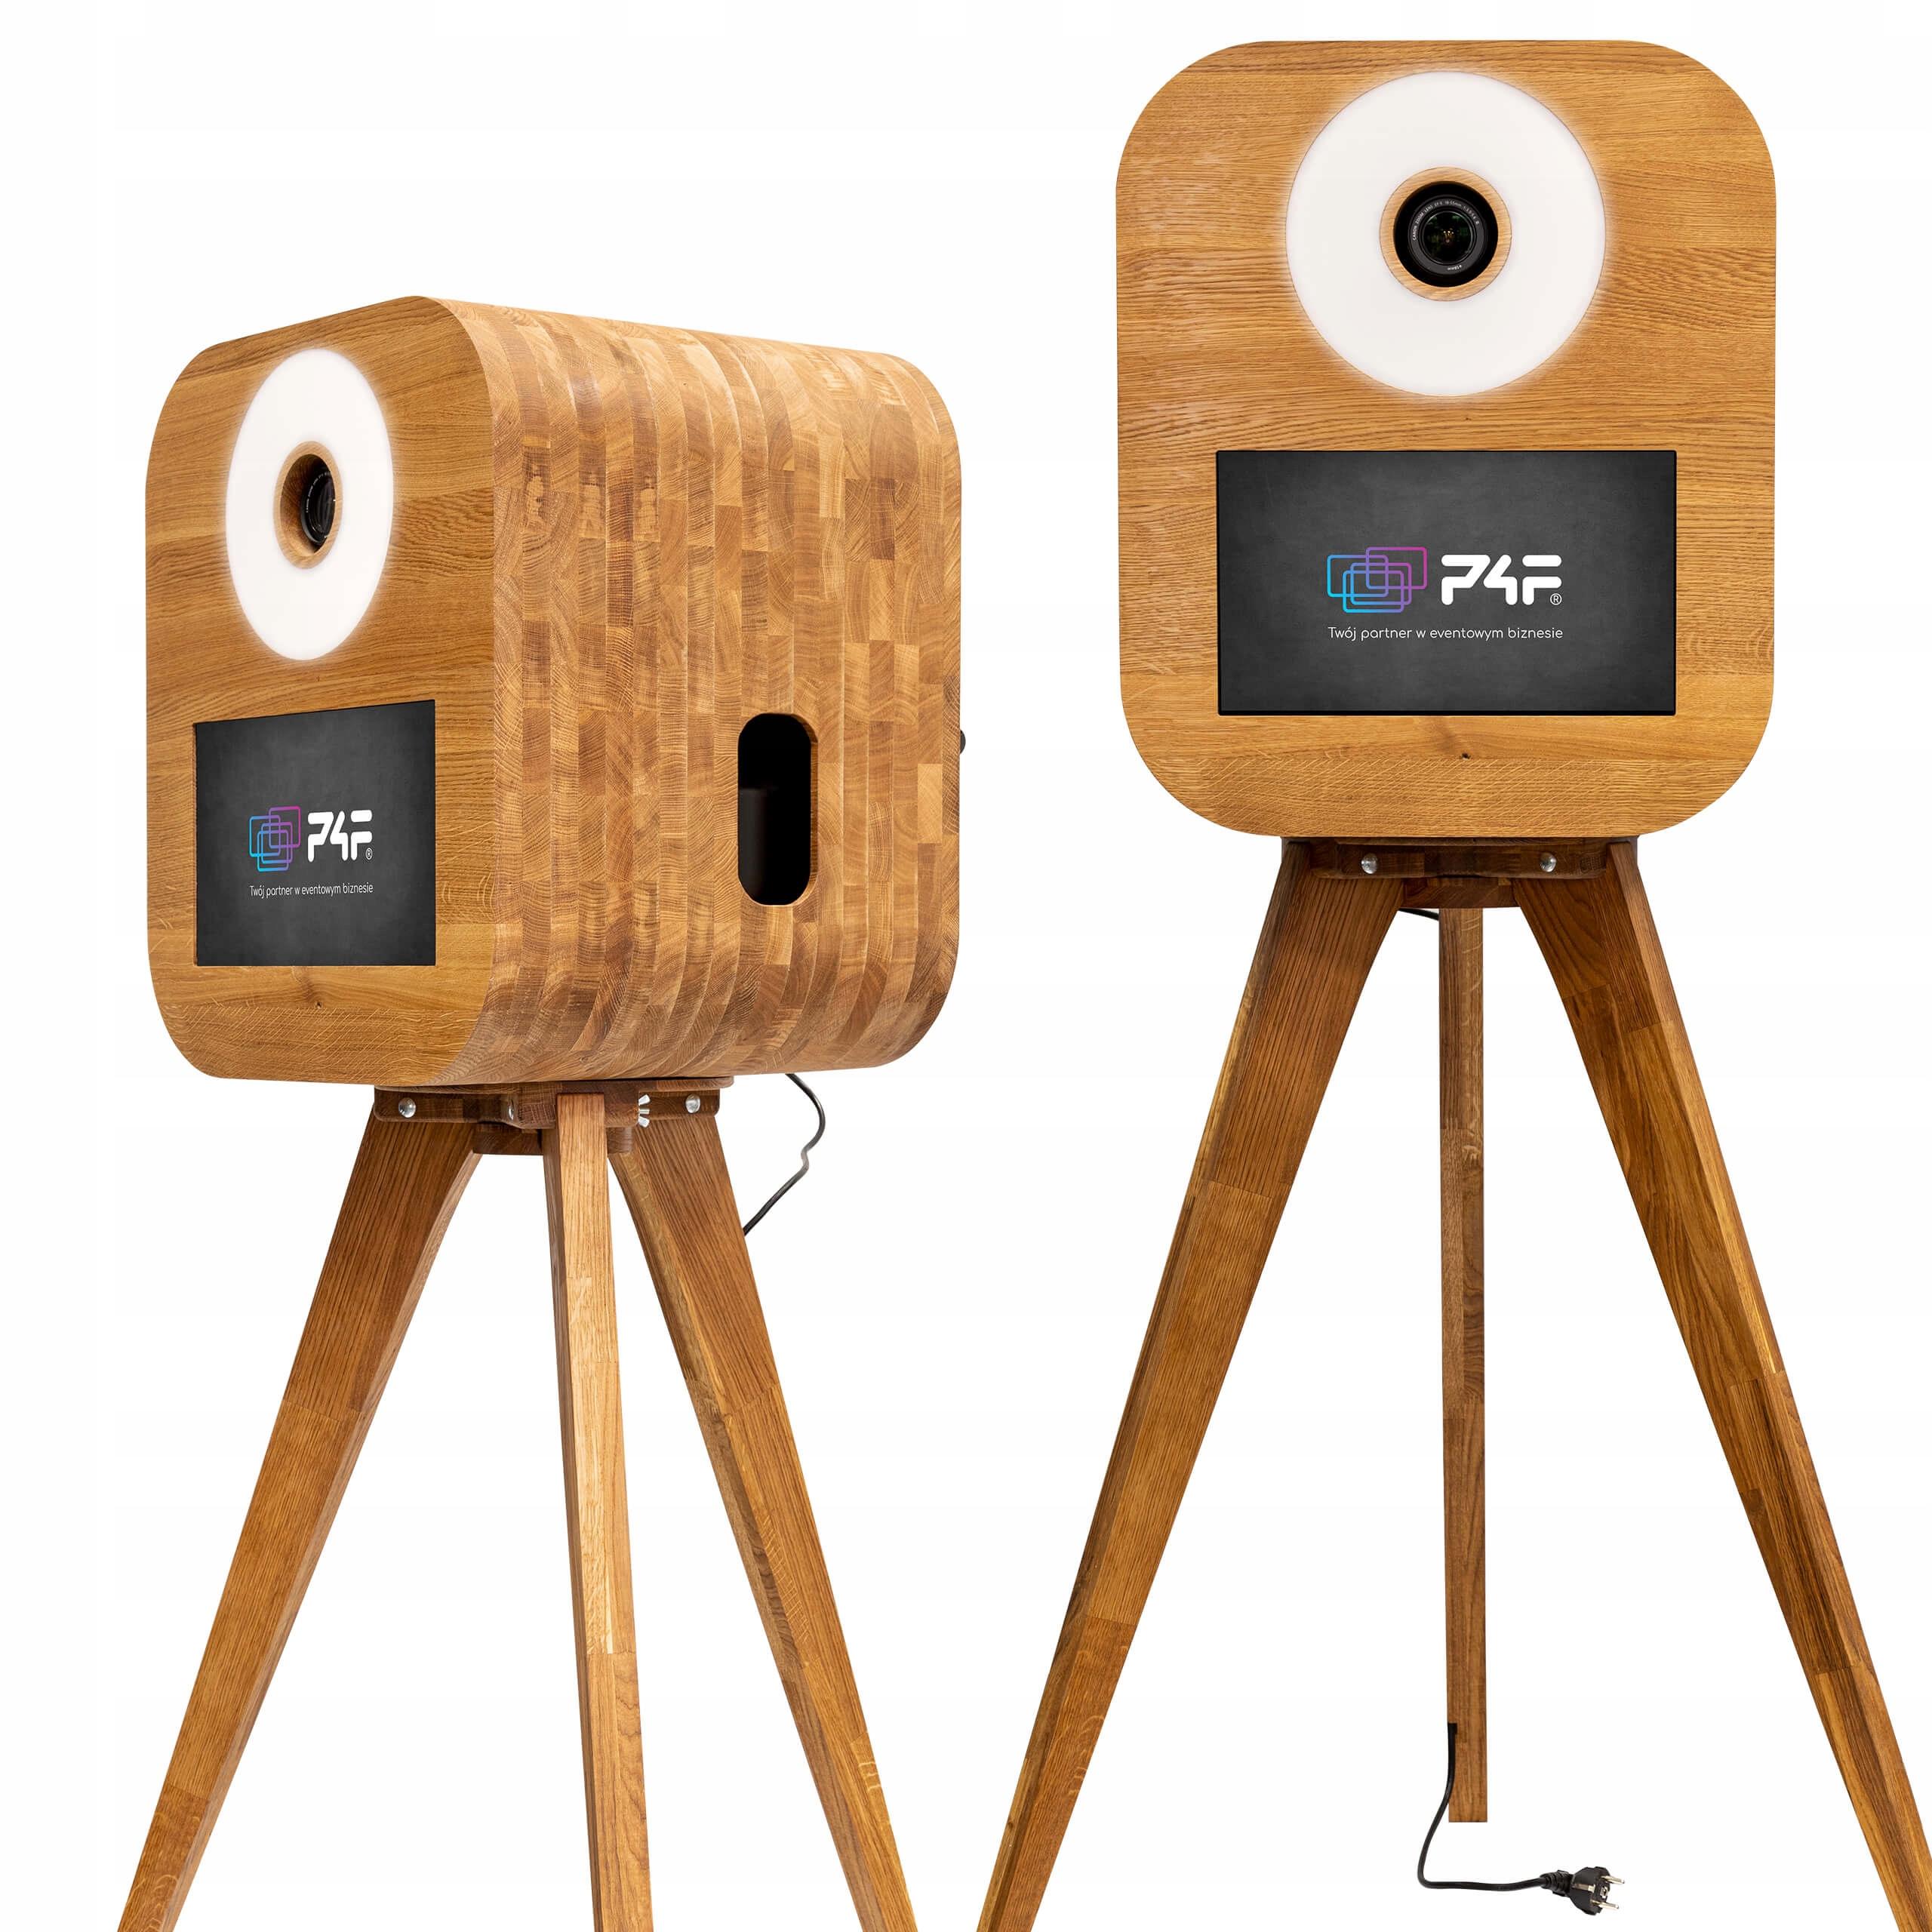 FOTO BOX P4F RETRO M drevený retrobox Plný